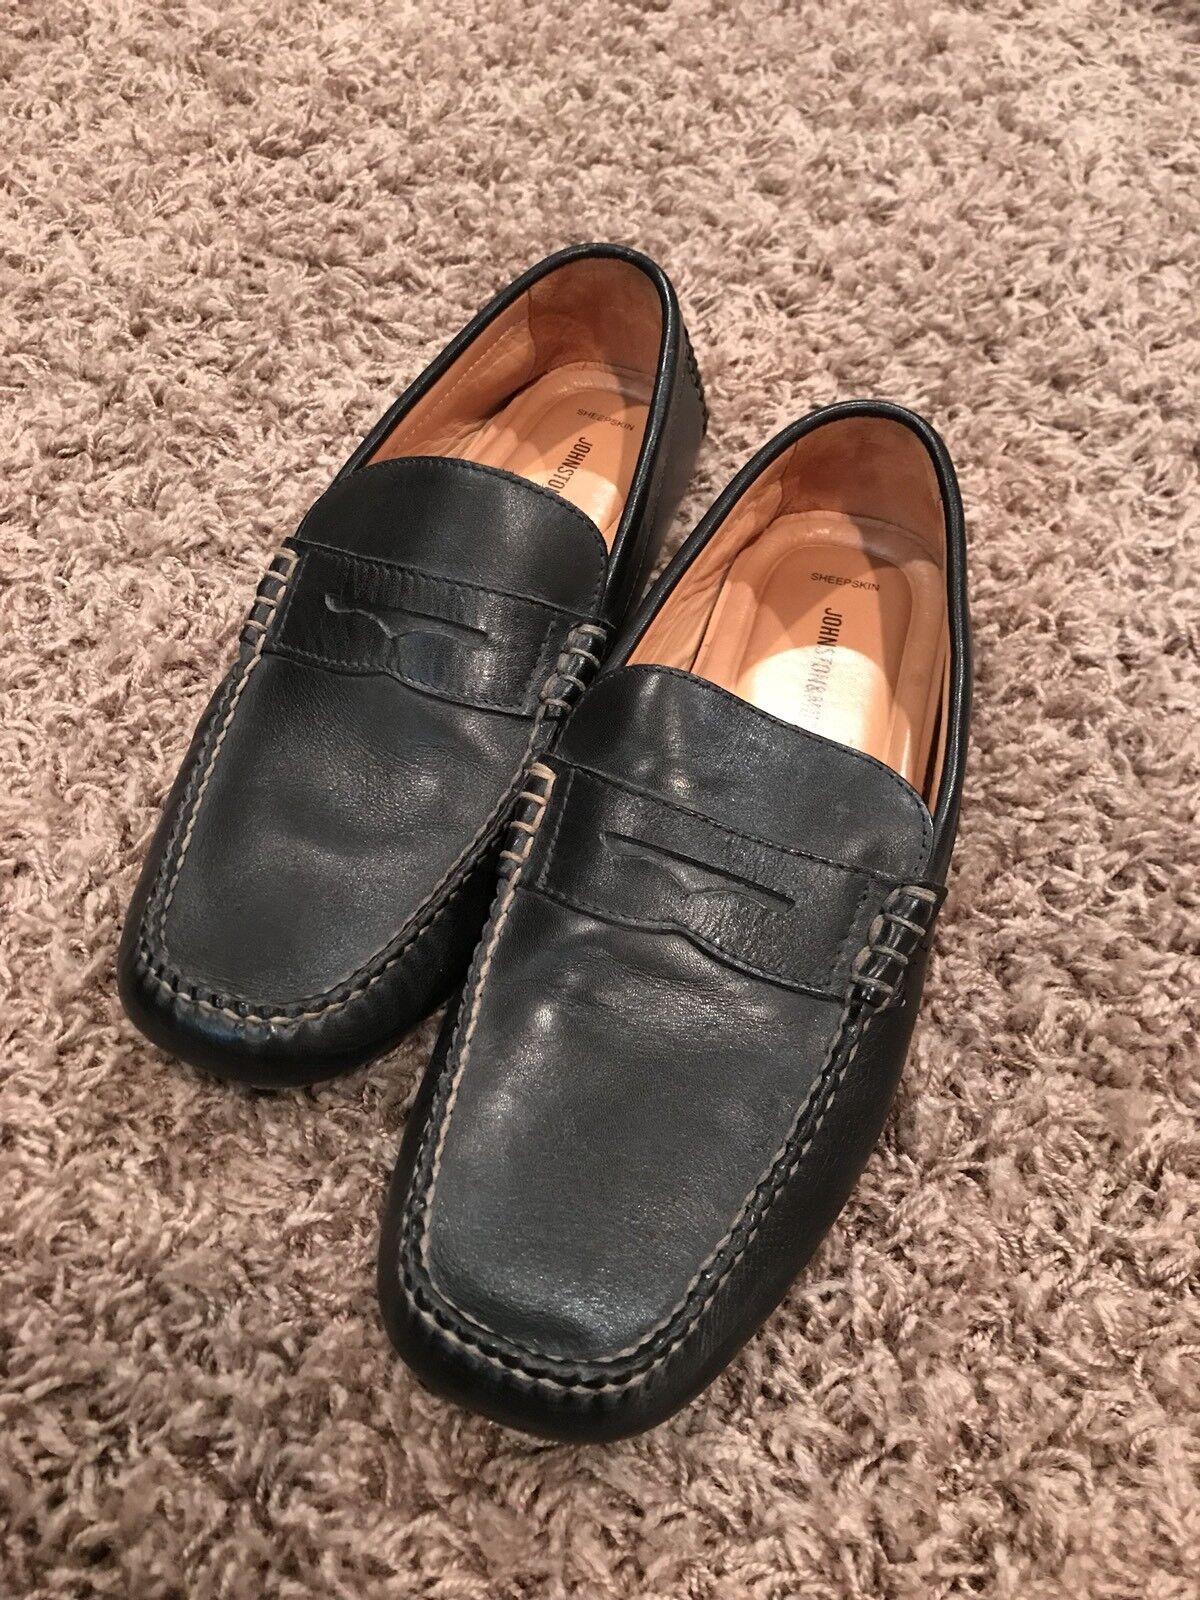 Johnston Murphy Slip On Loafers 10.5 black